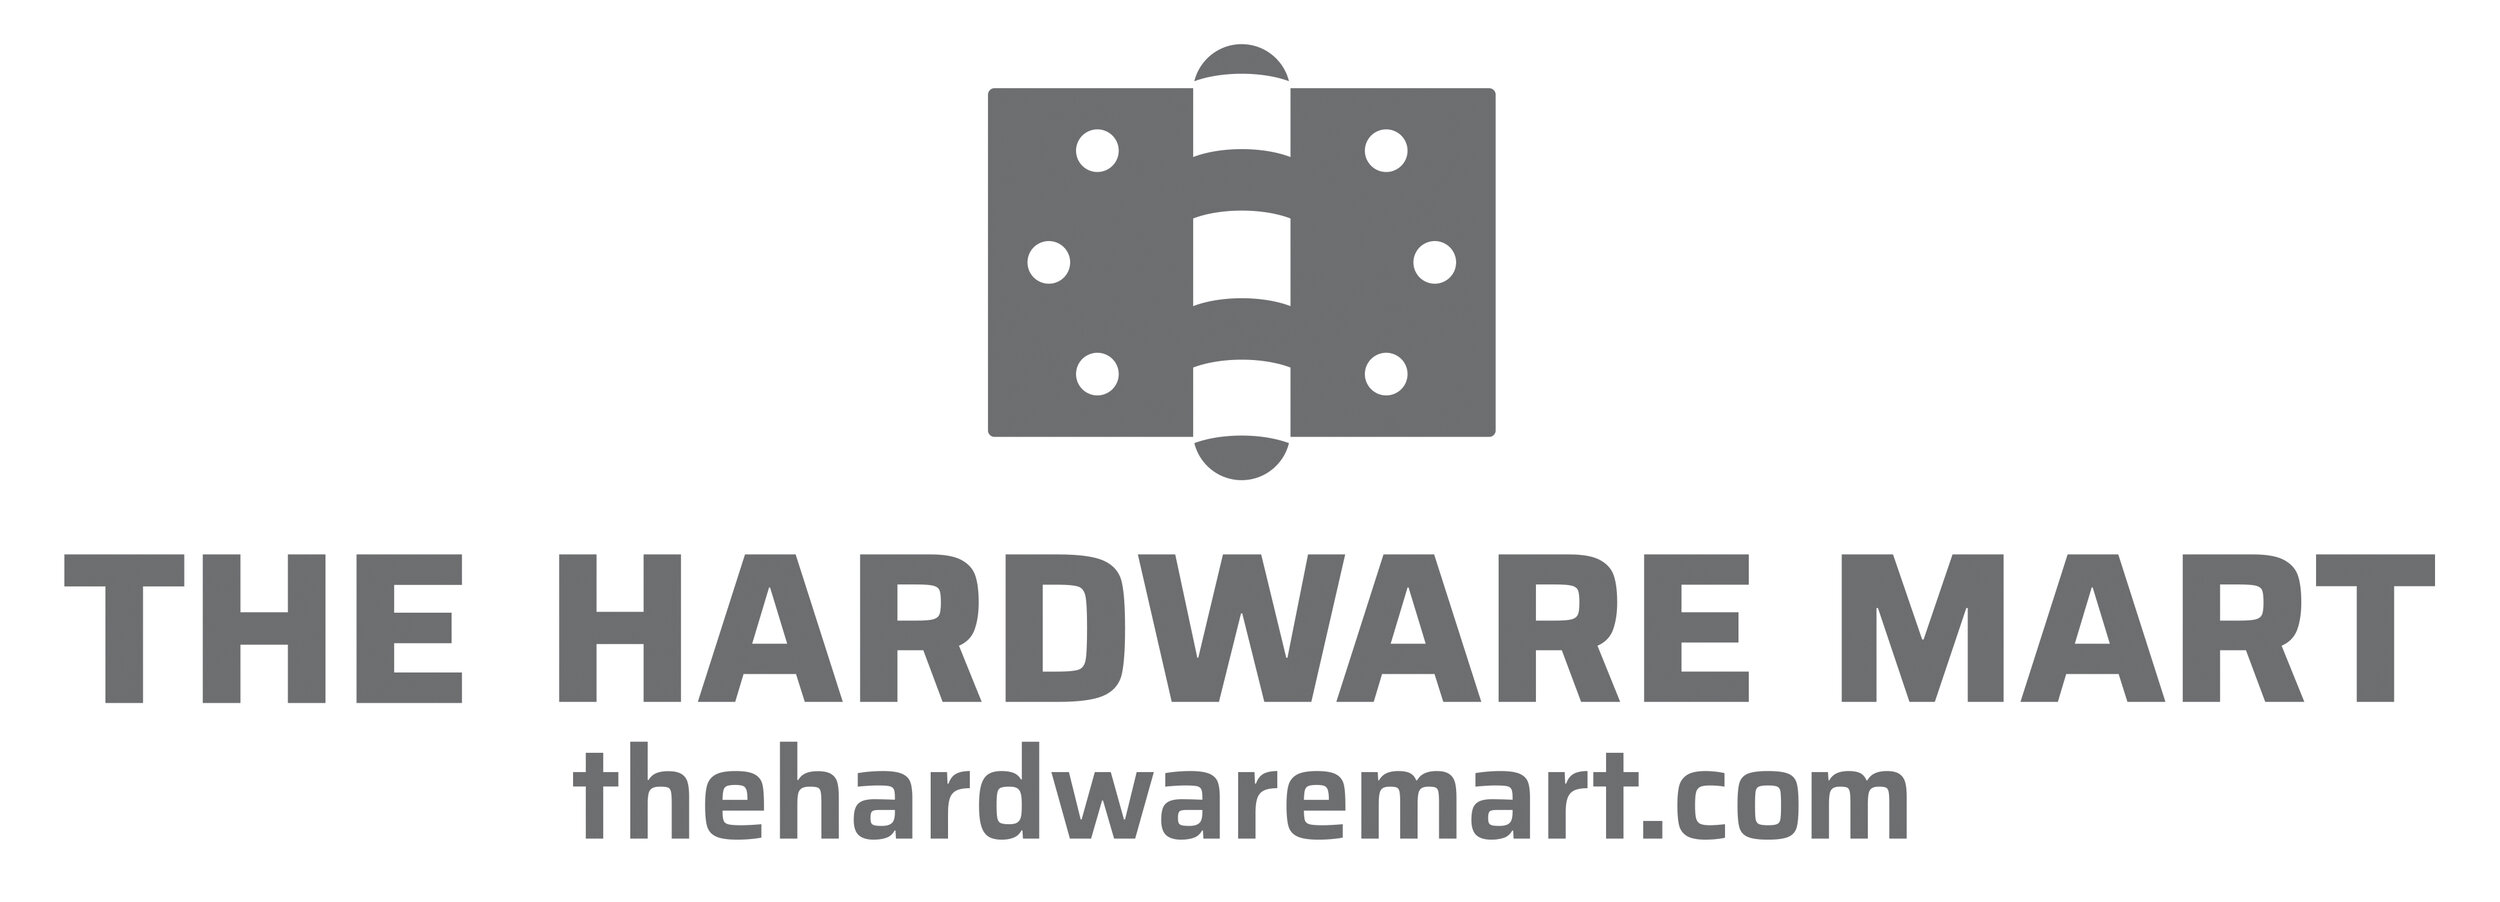 The Hardware Mart logos 6.jpg